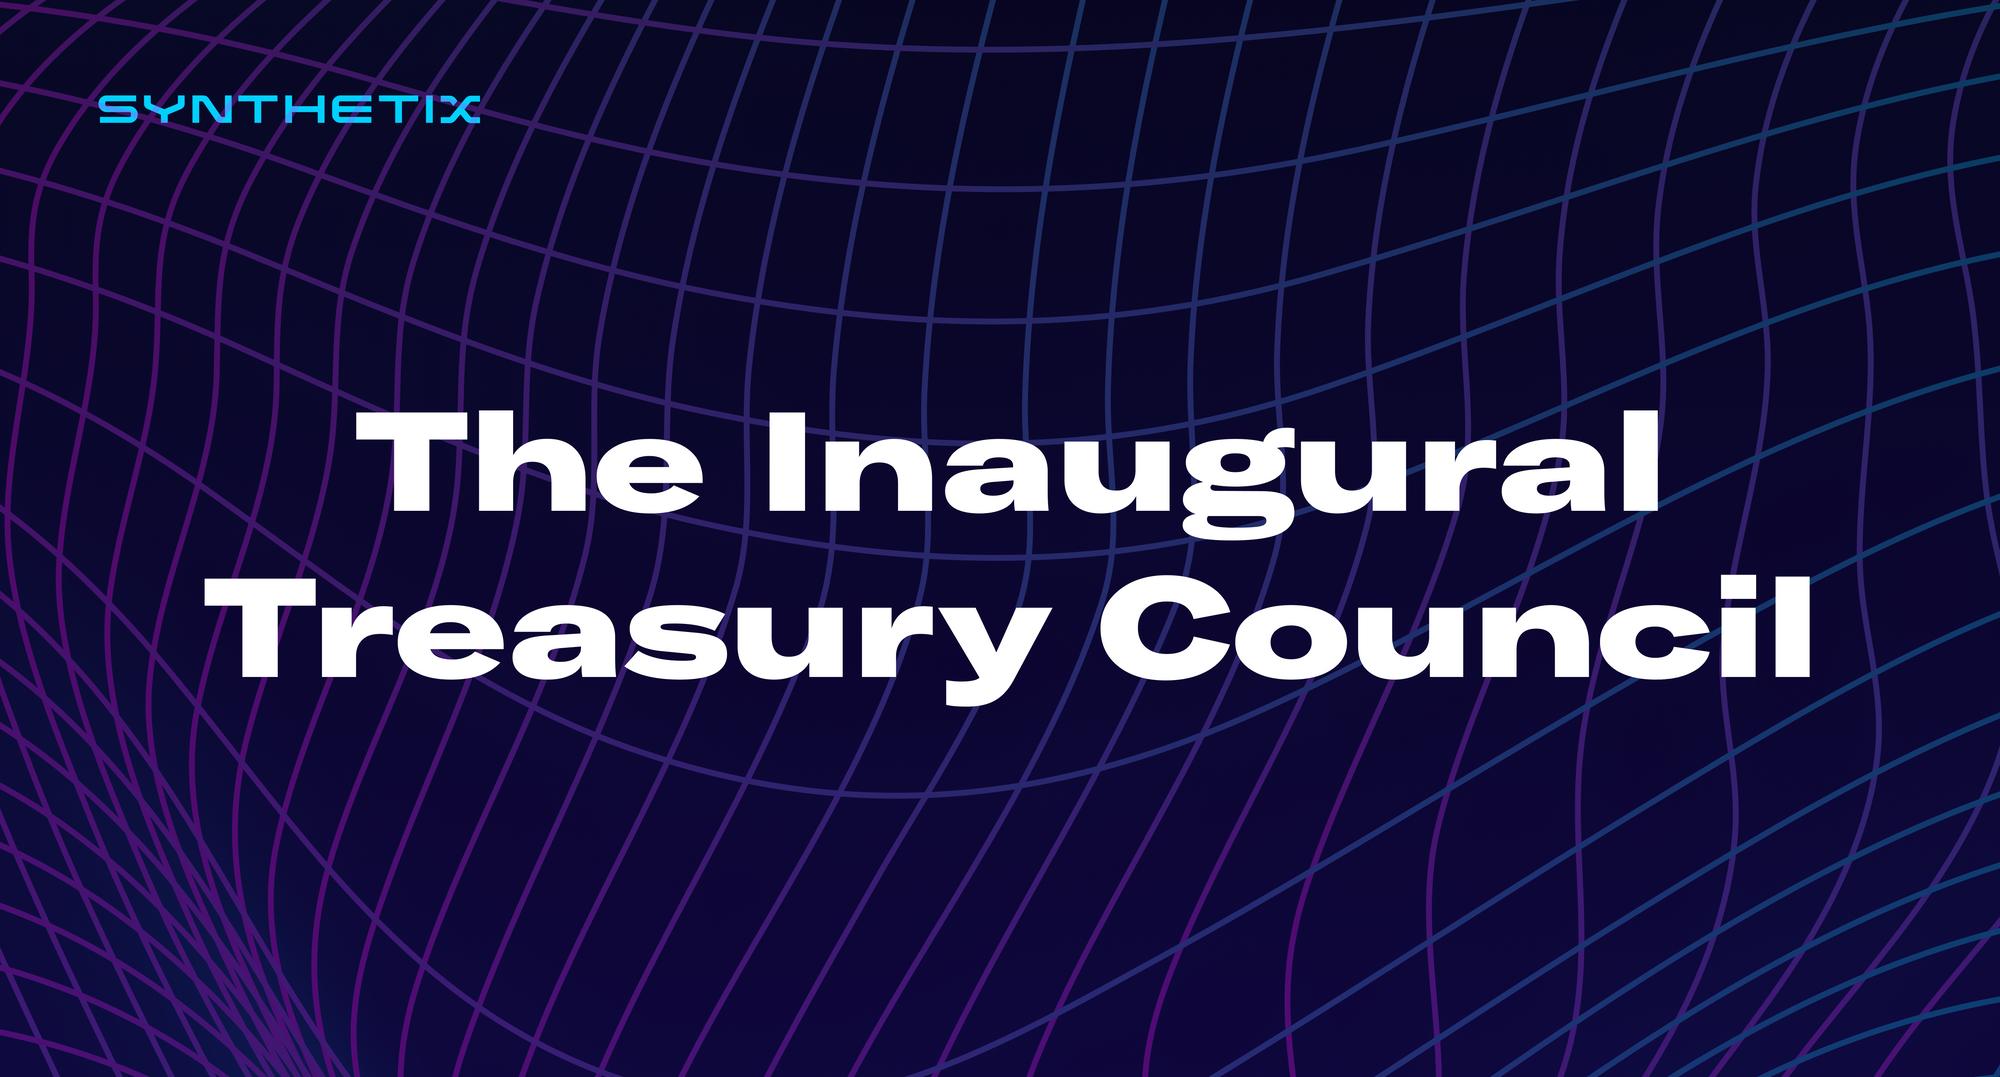 The Inaugural Treasury Council